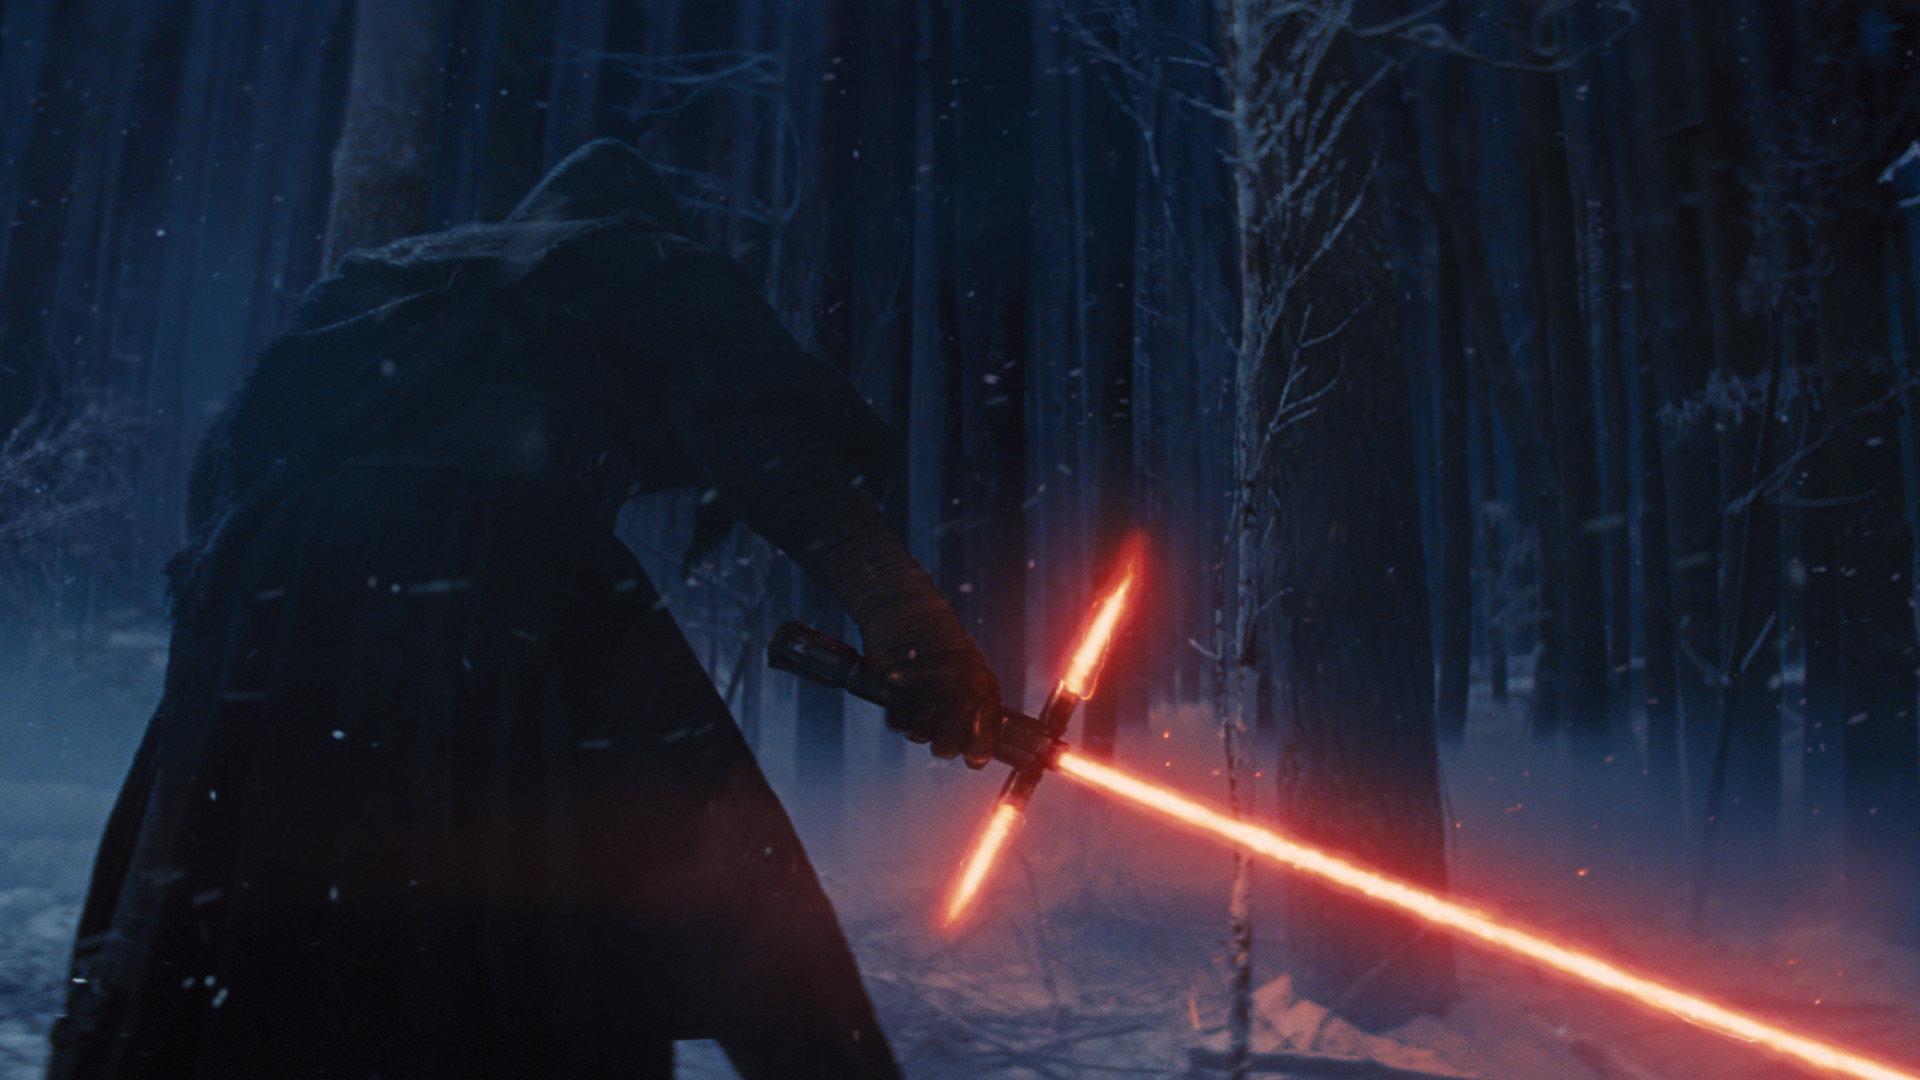 star wars episode 7 vii the force awakens wallpaper full hd 1920x1080 282671